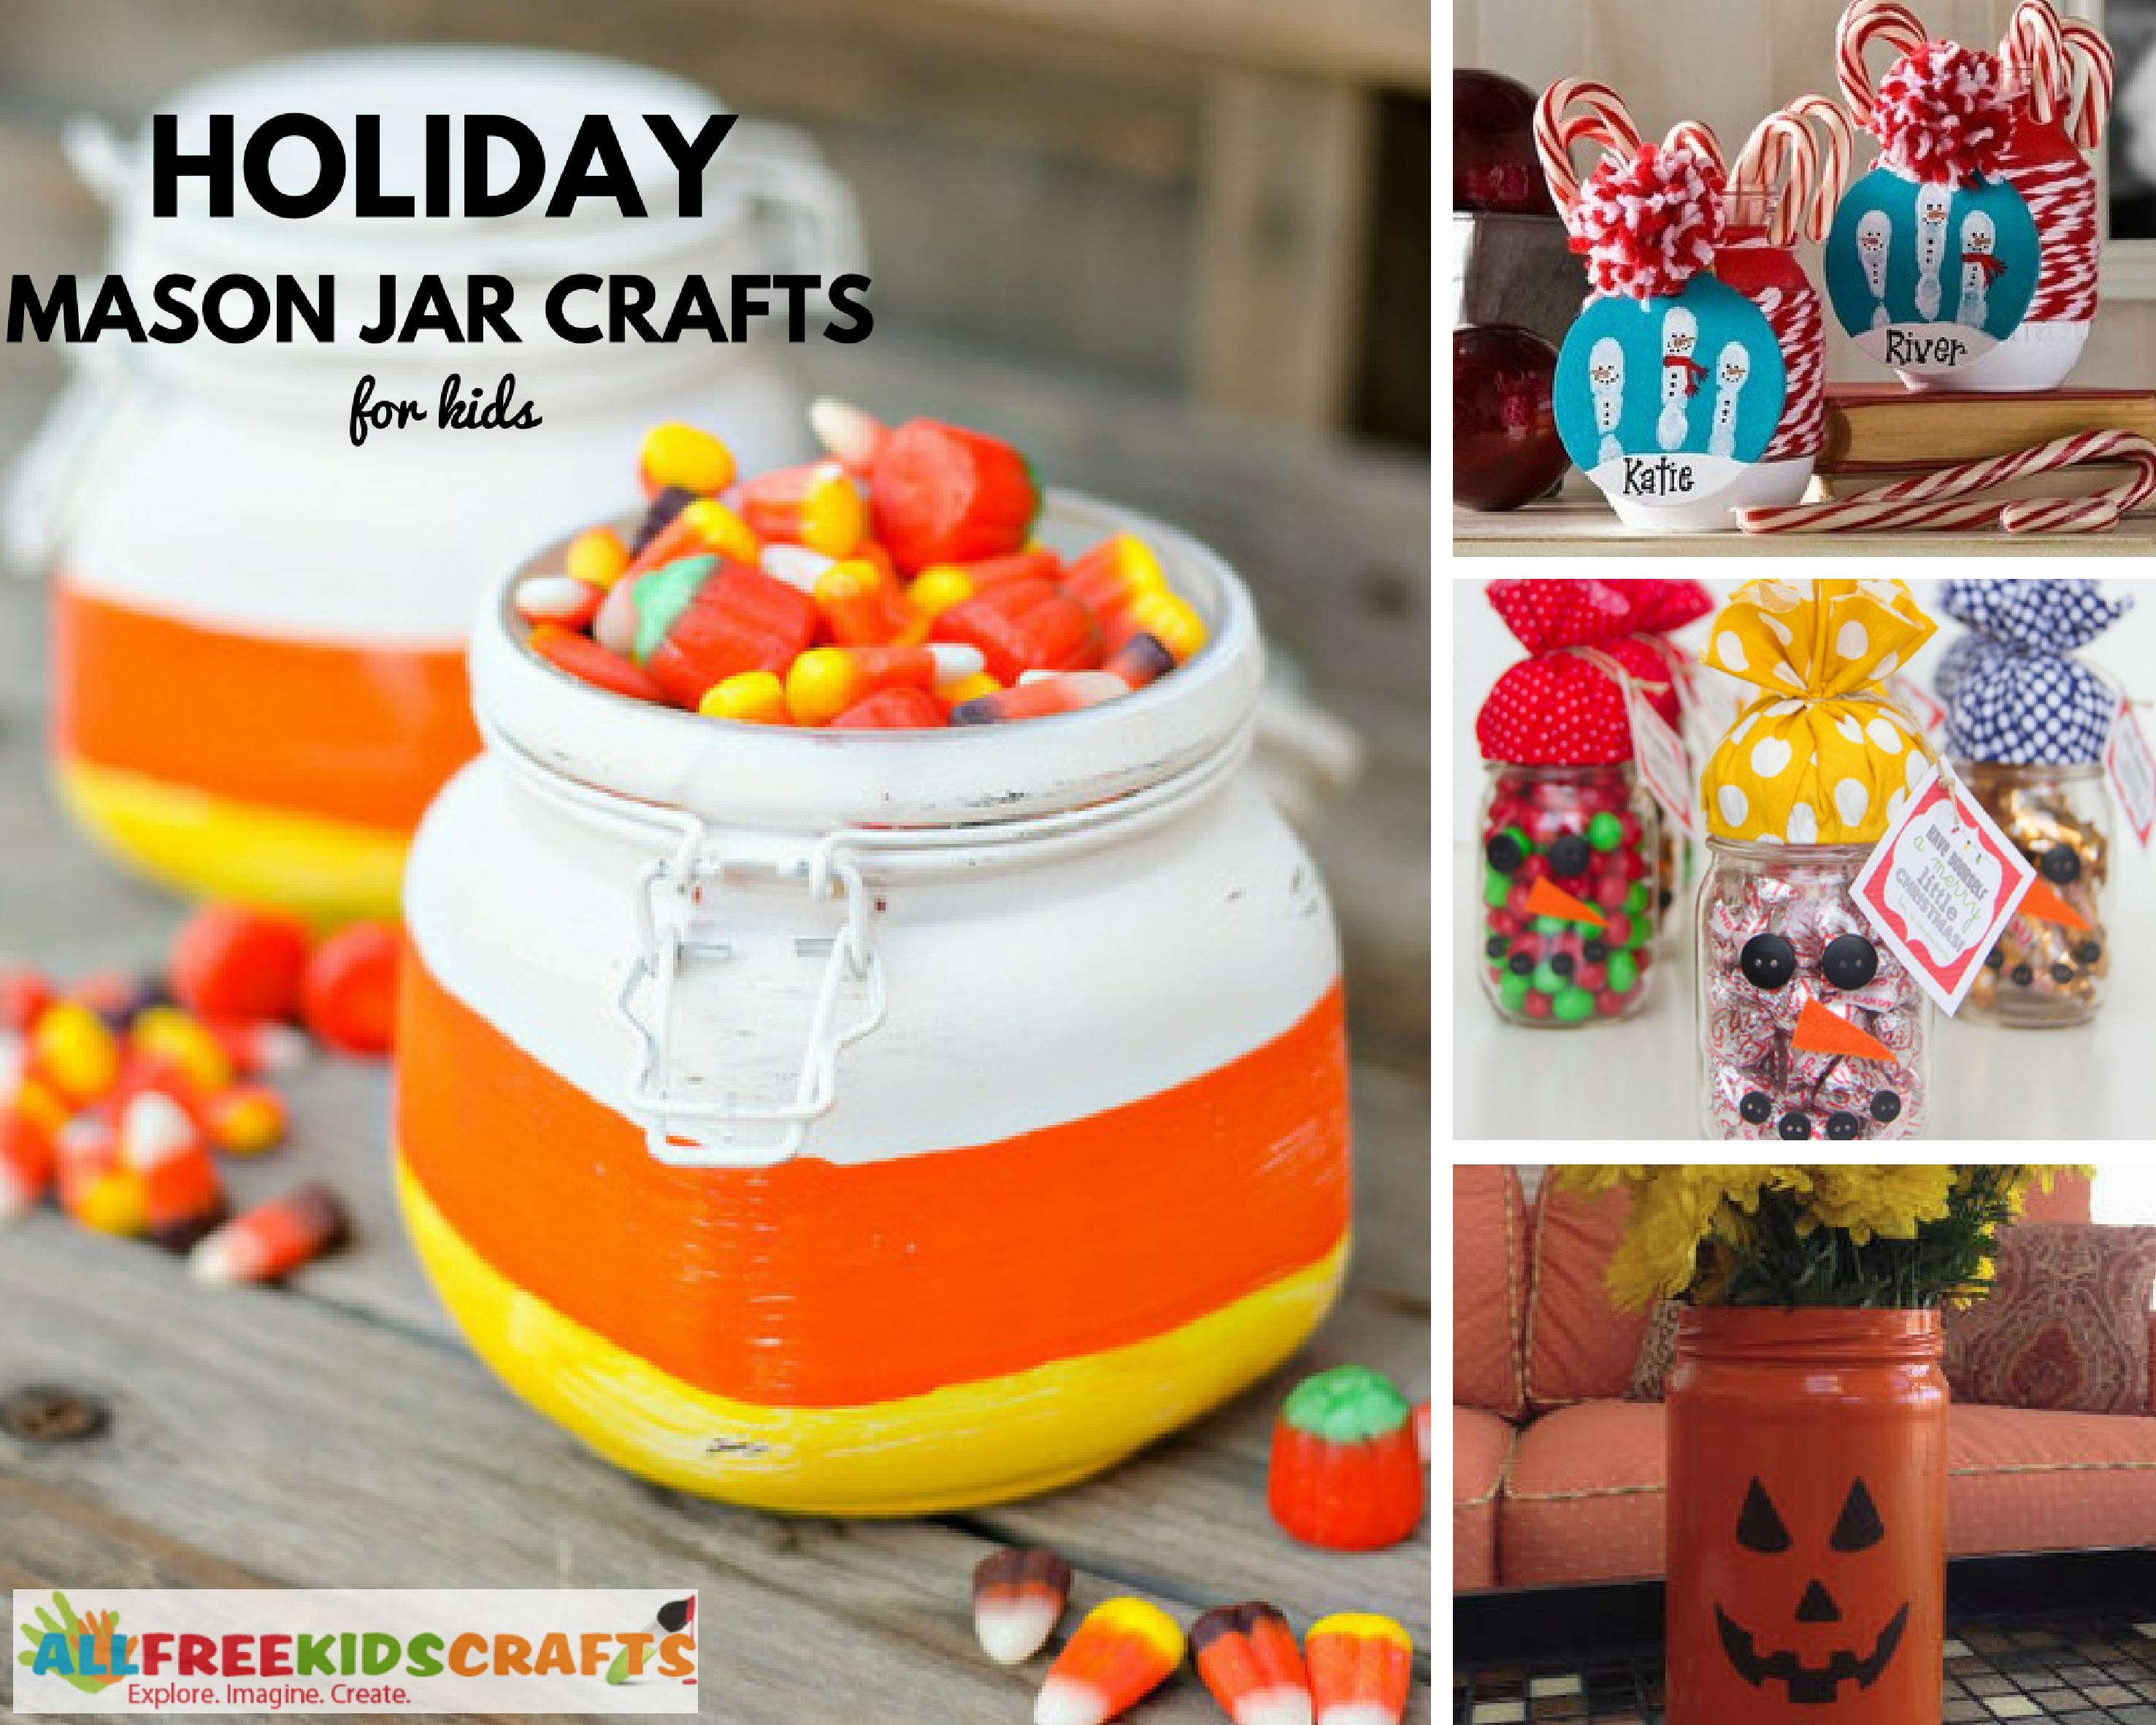 Holiday Mason Jar Crafts for Kids